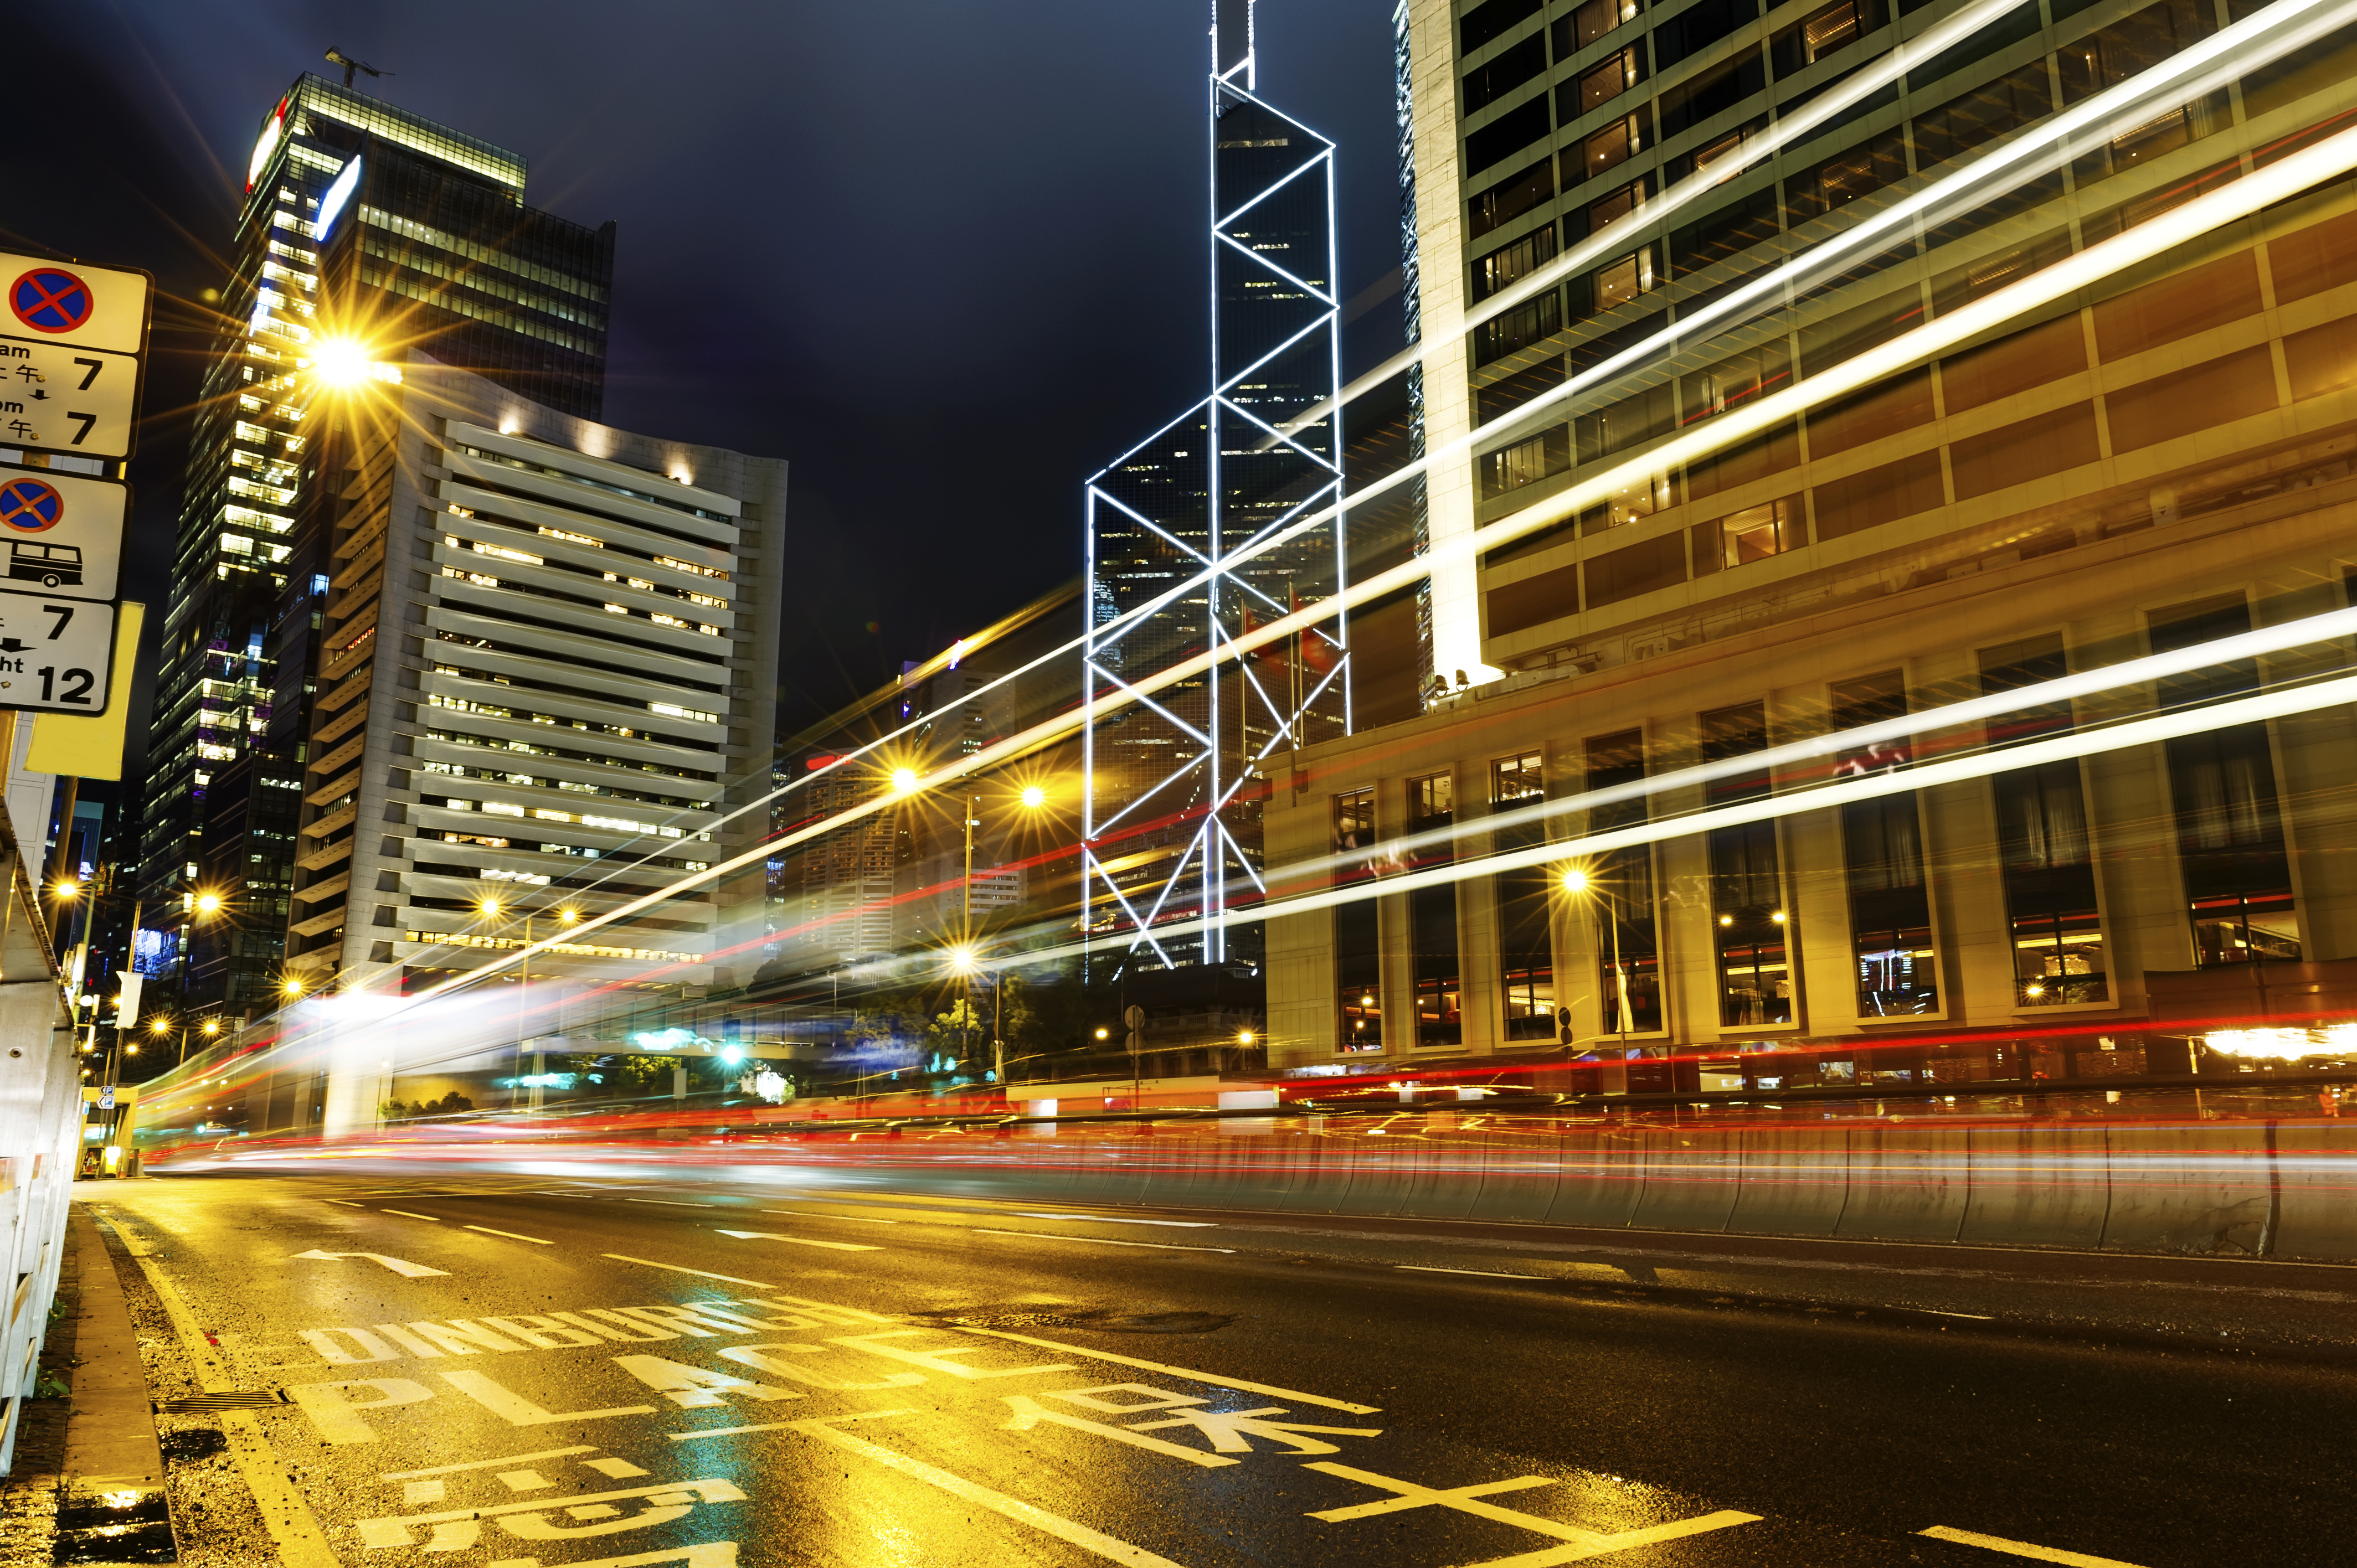 [THE매력적인]홍콩In 마카오out  페리편도포함 2박4일-홍콩 피크트렘티켓제공